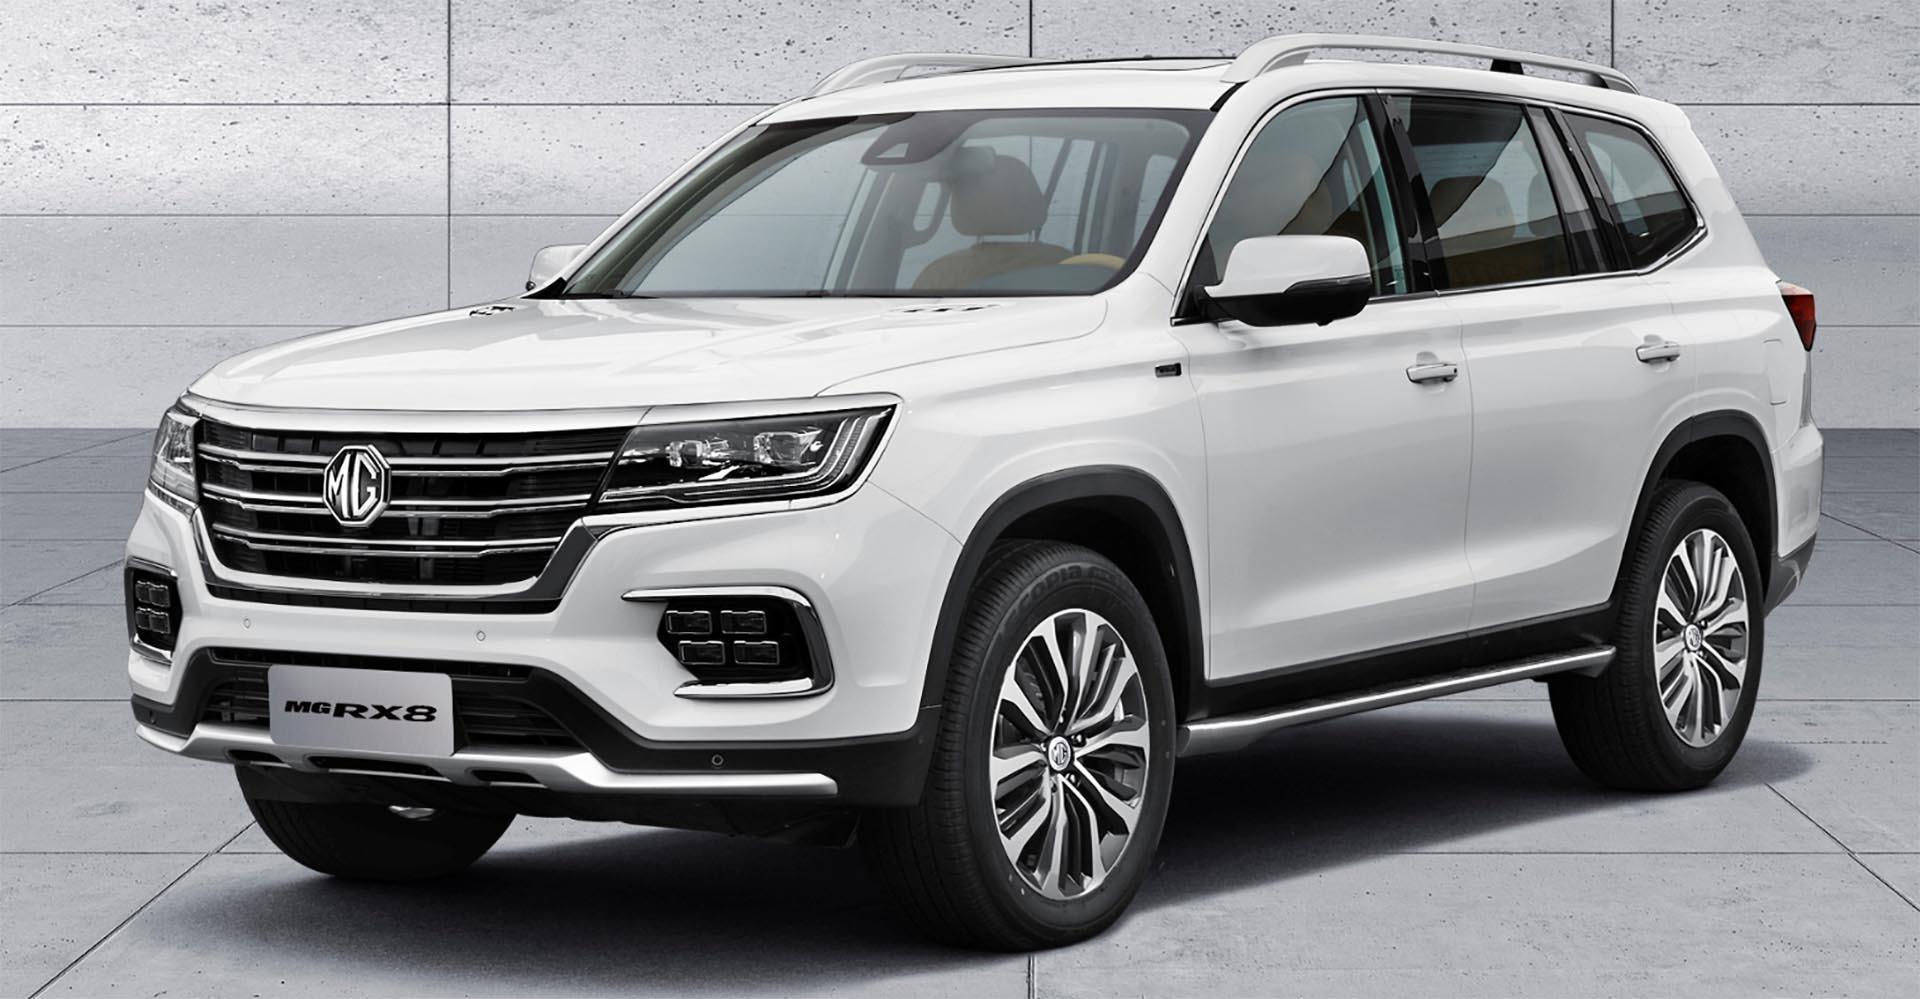 2020 Mg Rx8 1 Arabs Auto